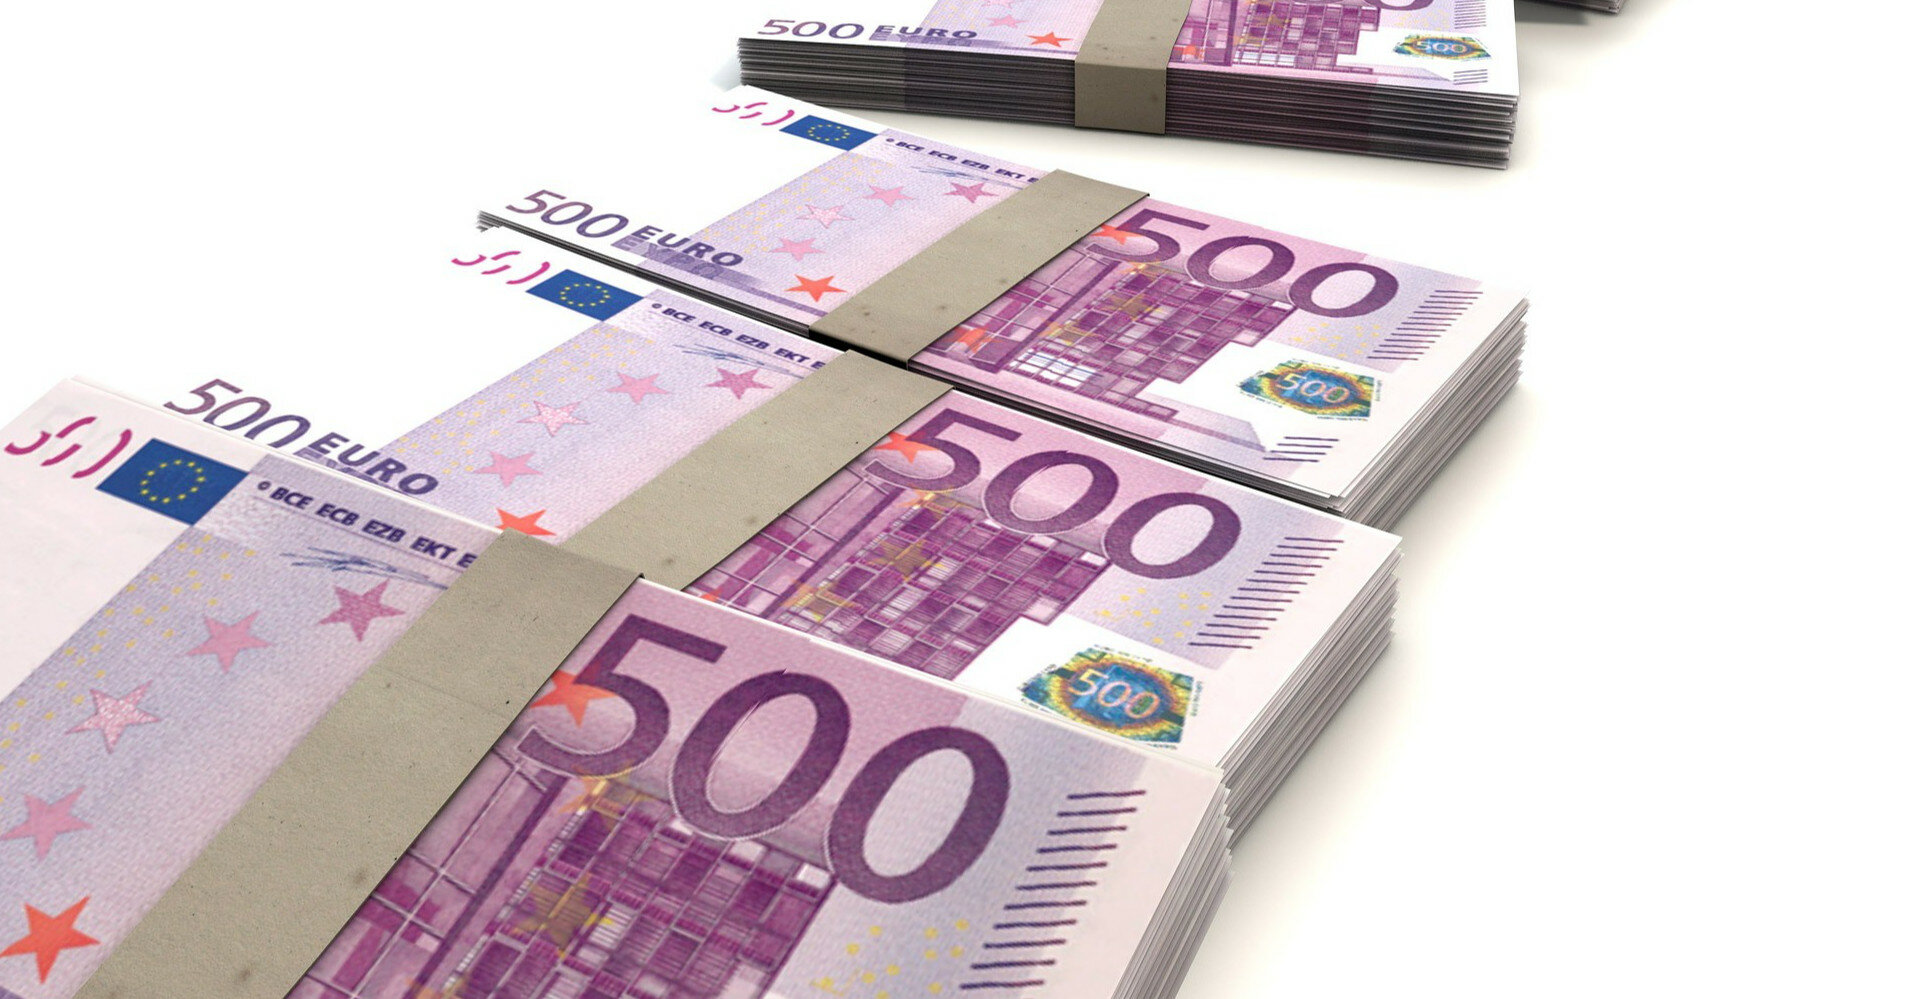 Европейцы накопили сотни миллиардов лишних сбережений